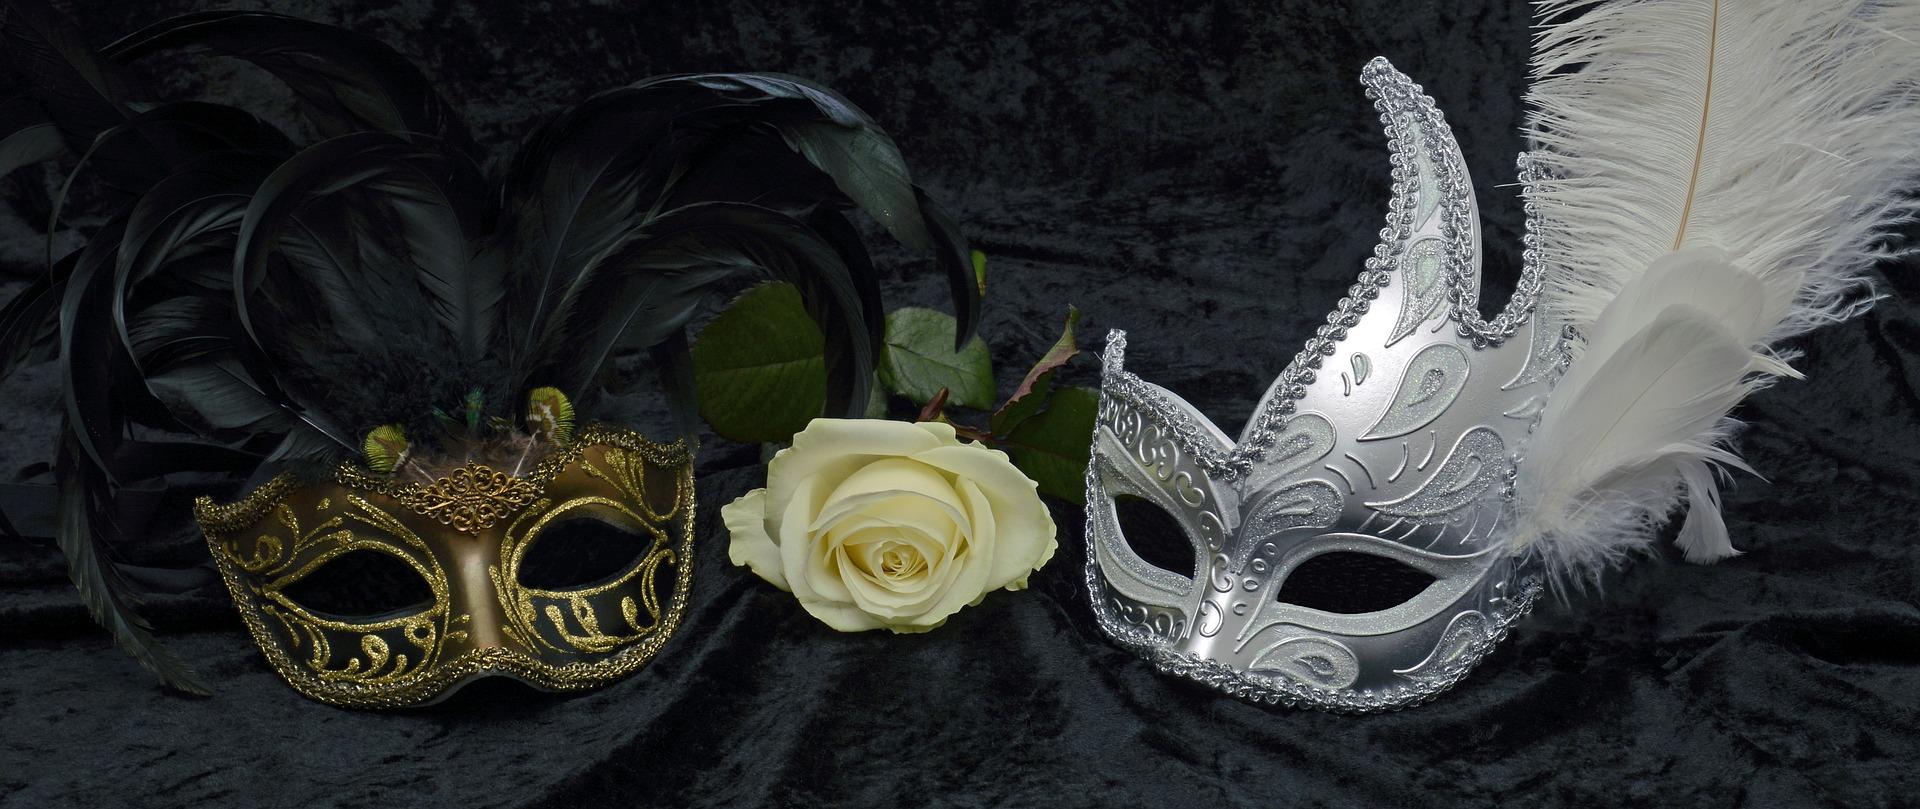 Carnaval de Venecia, Italia carnaval de venecia - 26495359748 f4fb64eca9 o - Carnaval de Venecia : la historia y elegancia toman la calle